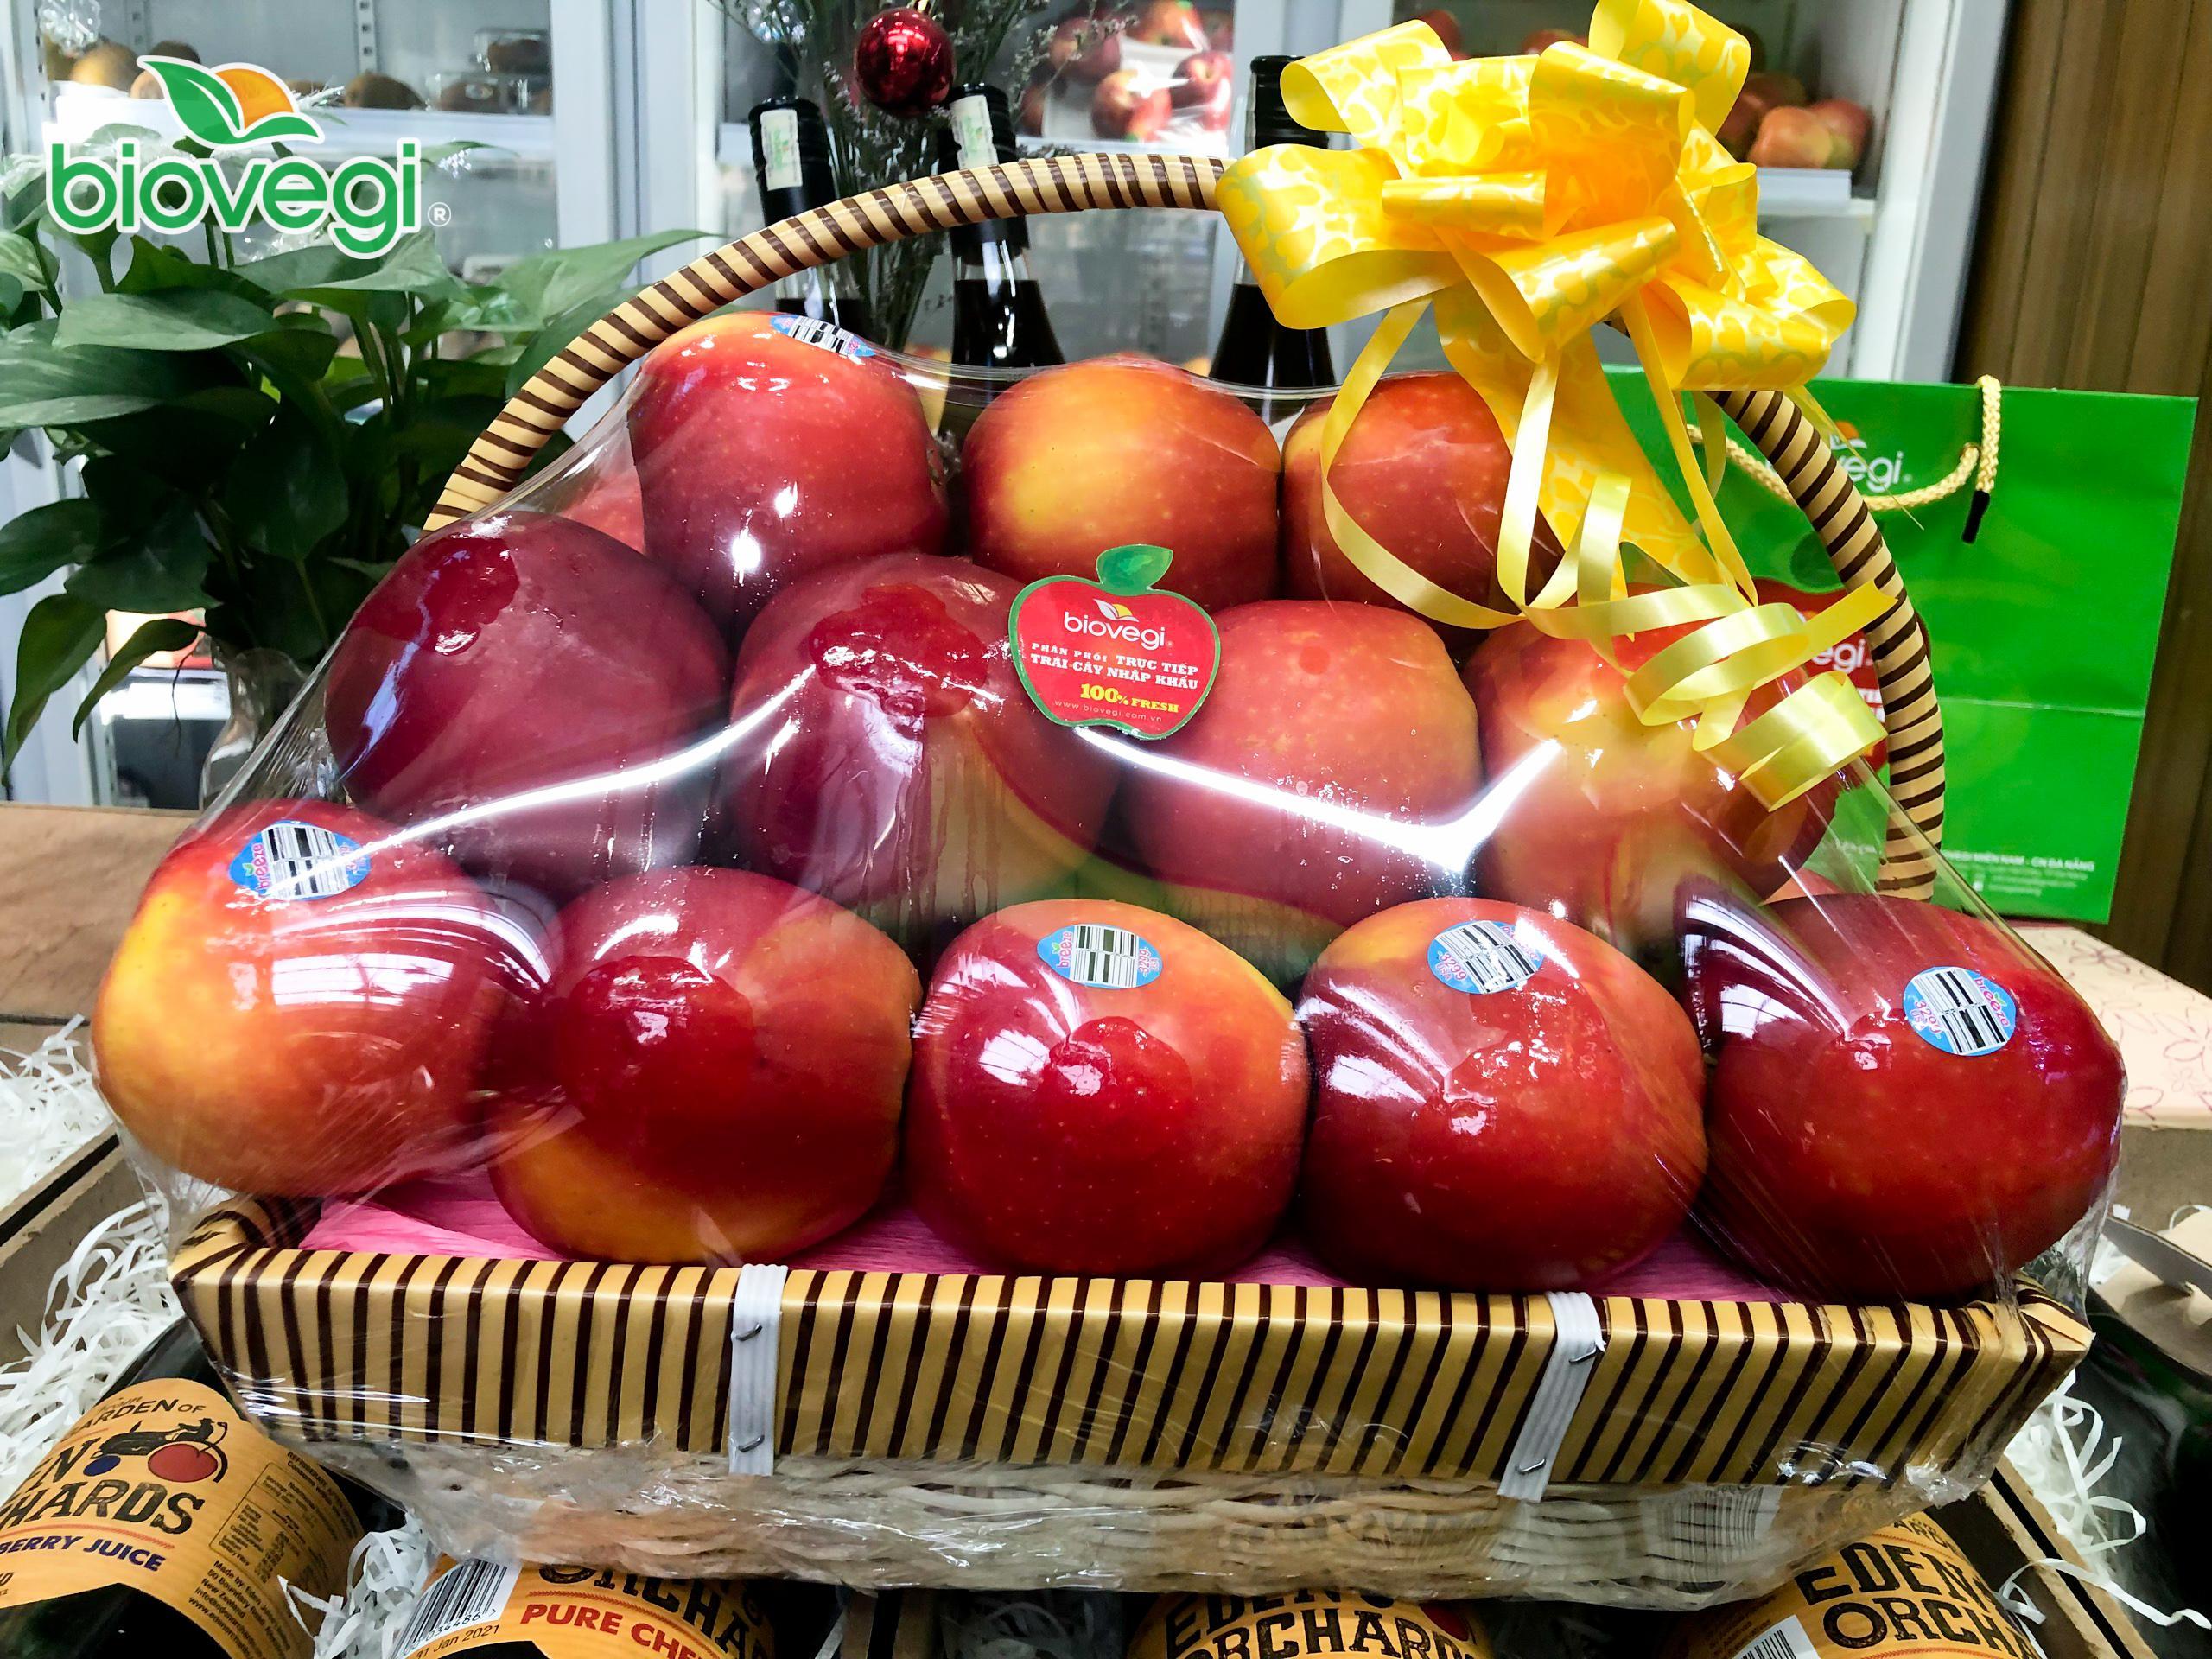 Giỏ 26 quả táo Ambrosia Canada